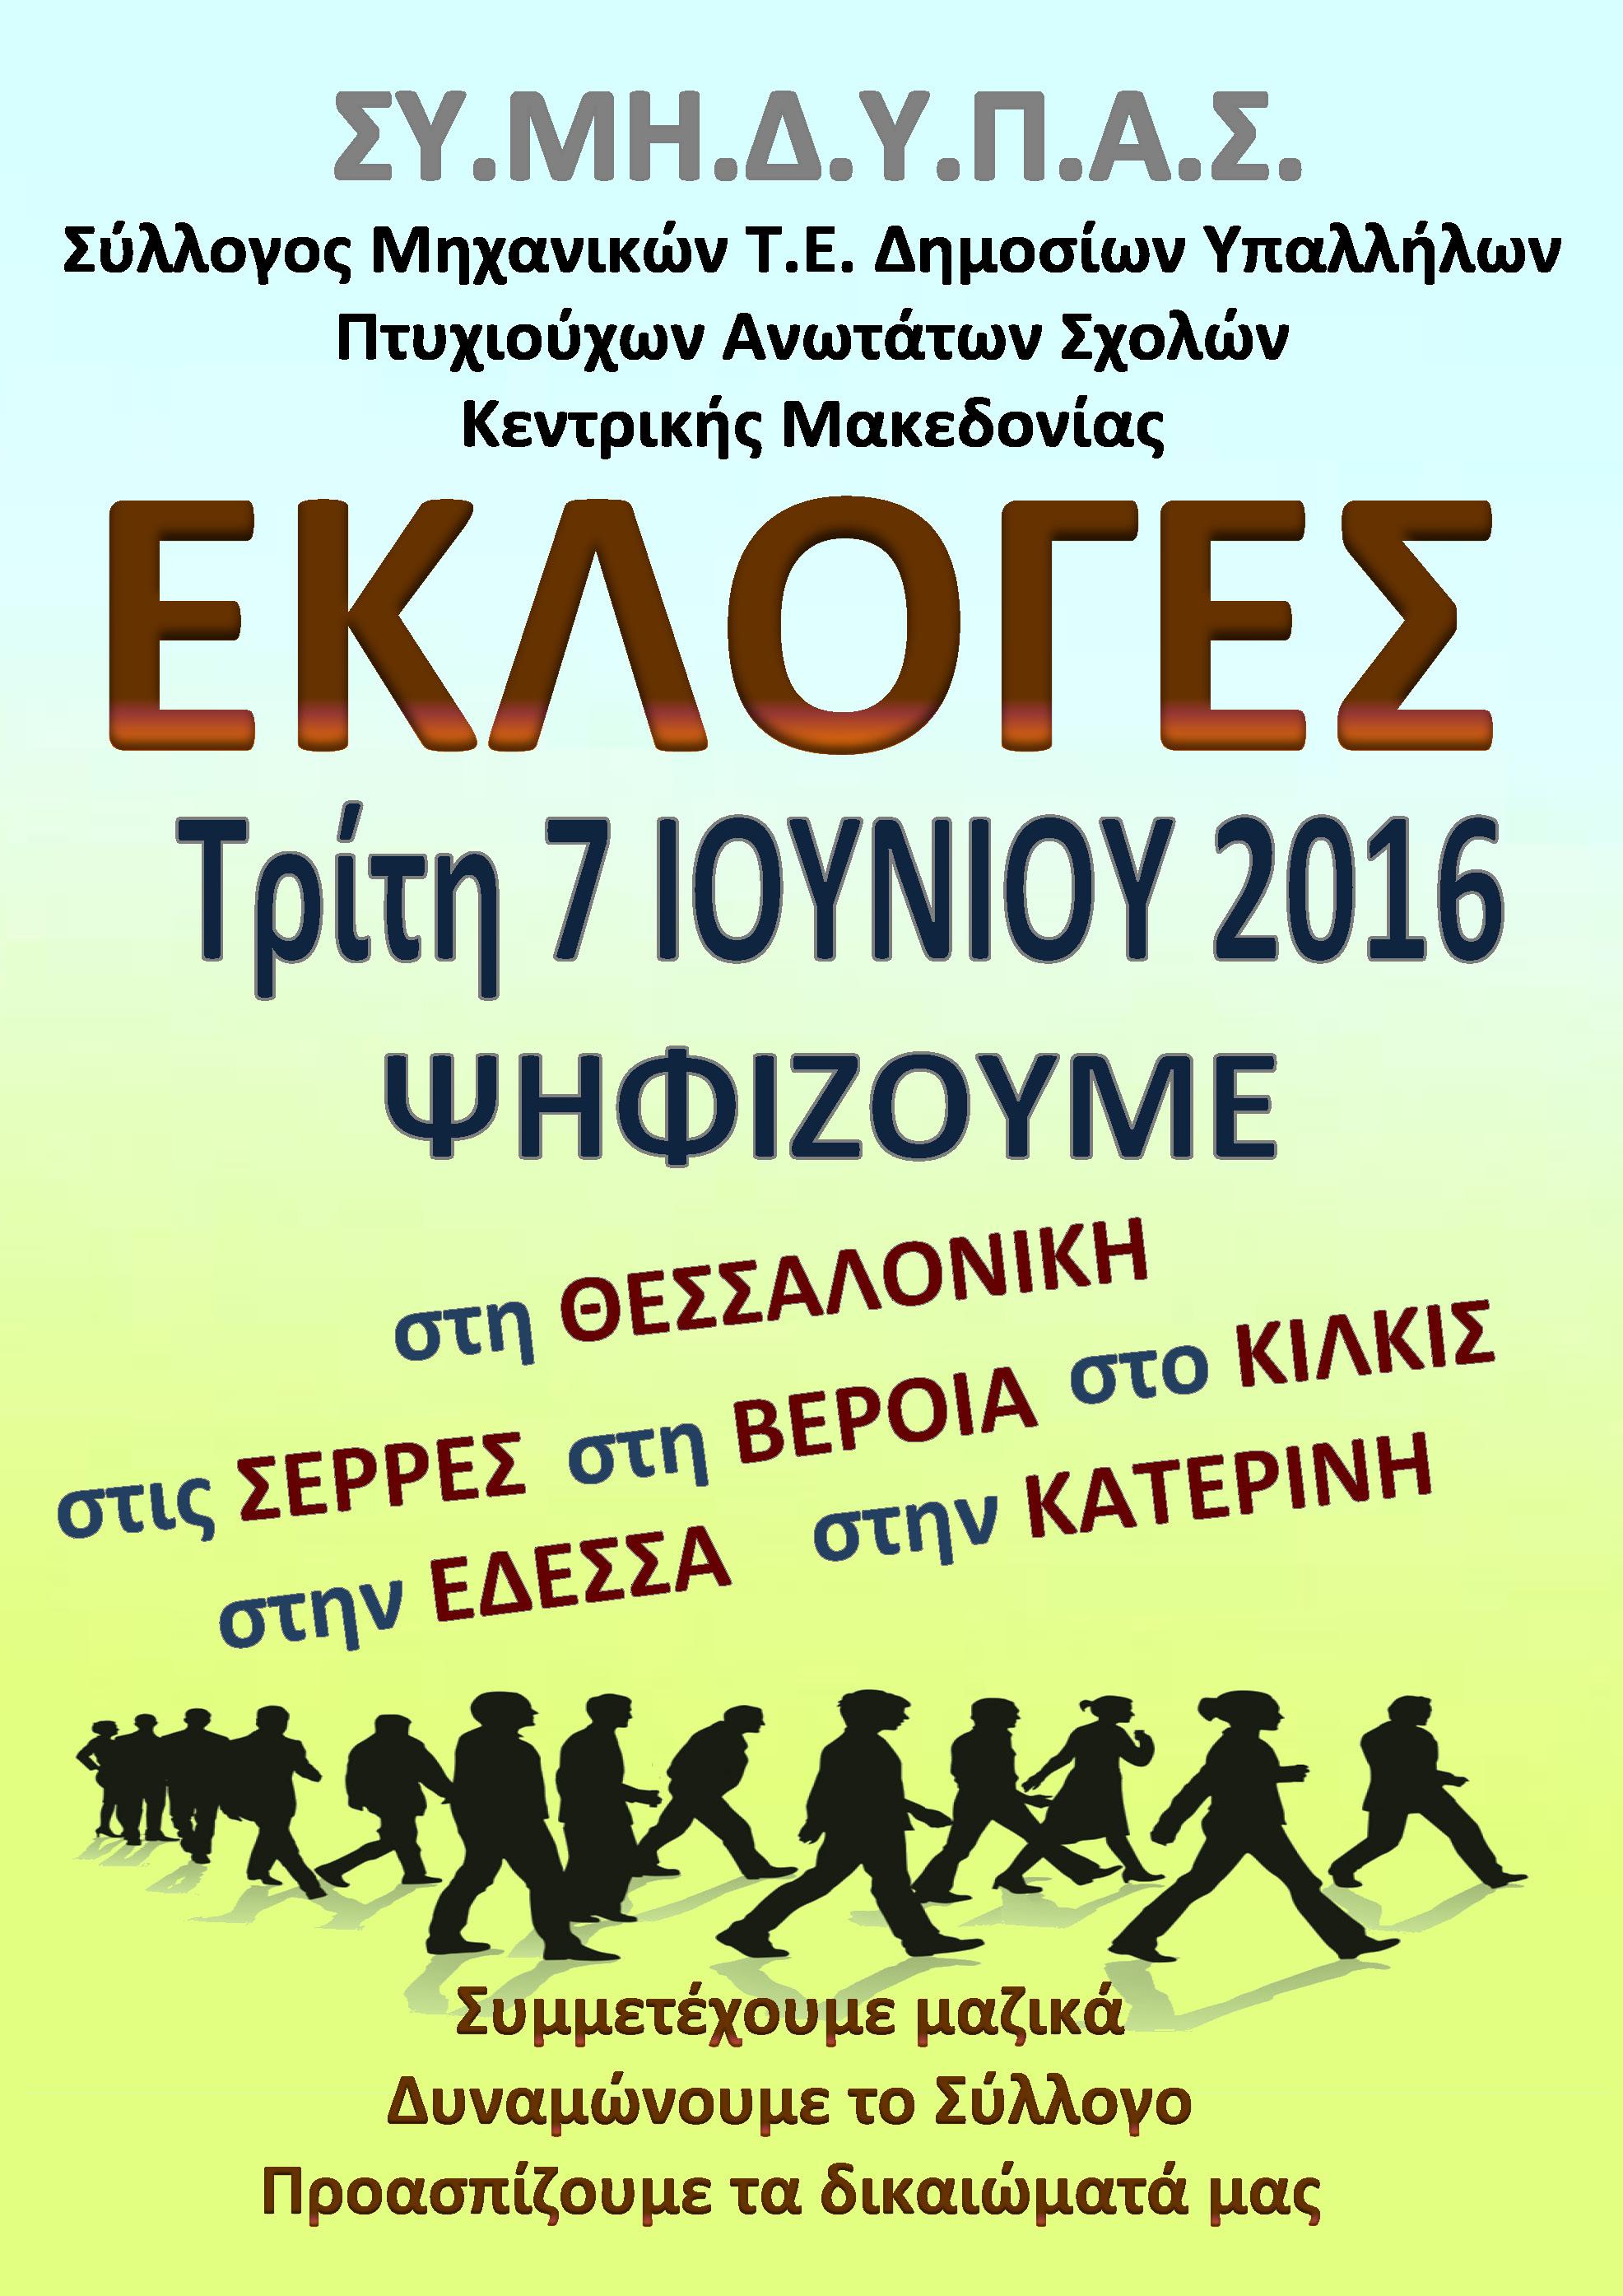 afisa ekloges genΙΚΙ TELIKO SXEDIO